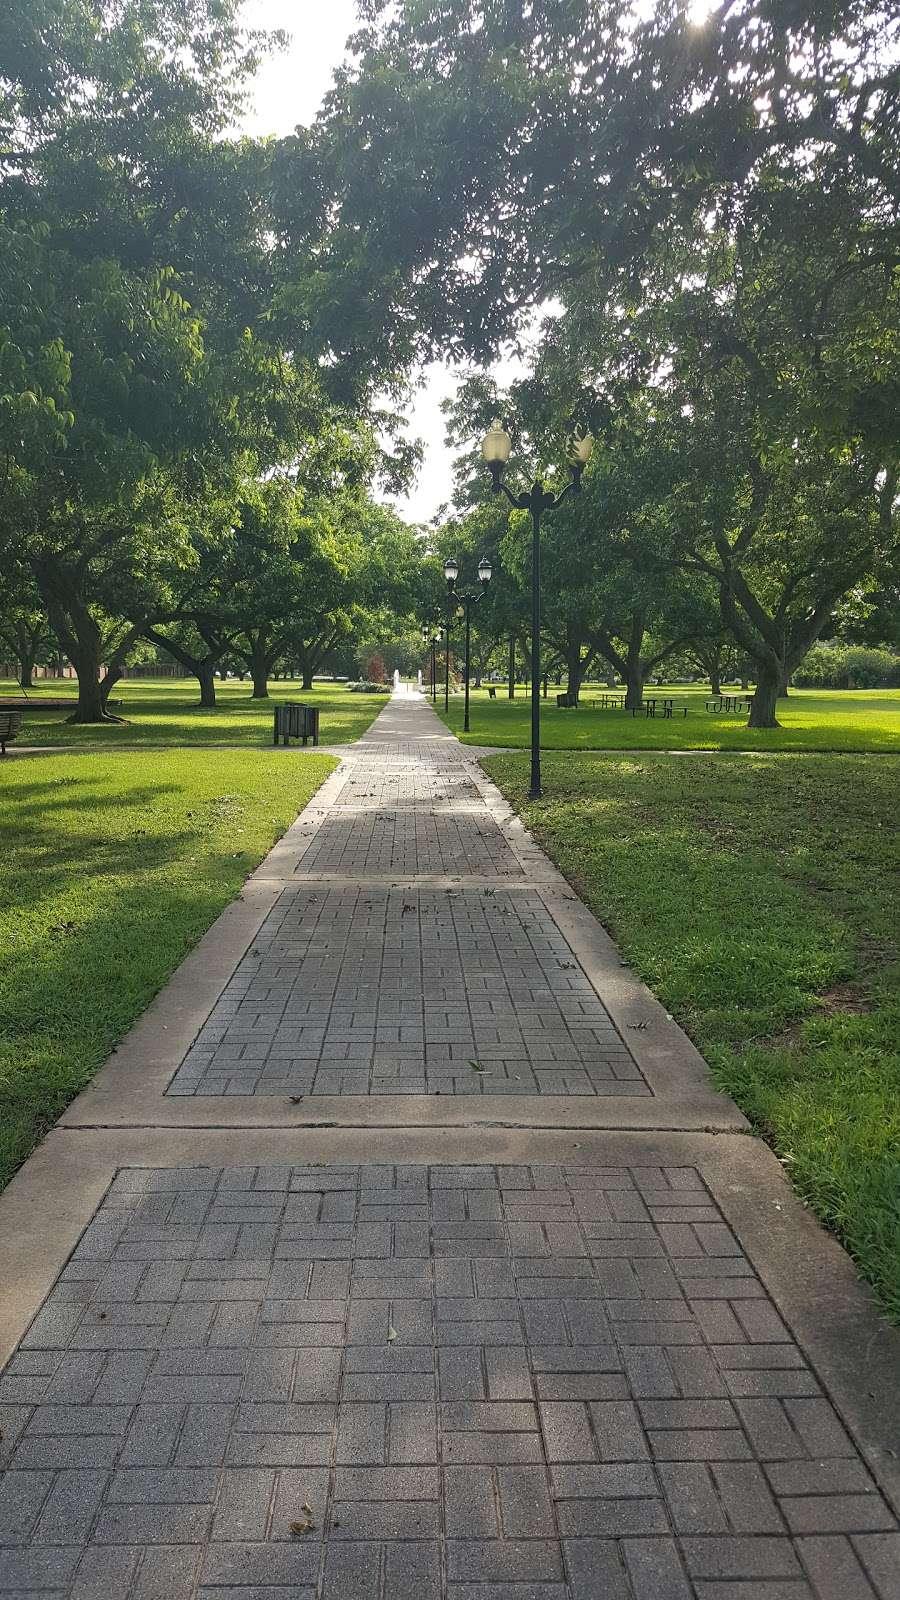 Pecan Park - park  | Photo 9 of 9 | Address: Pecan Orchard Blvd, Sugar Land, TX 77479, USA | Phone: (281) 565-0616